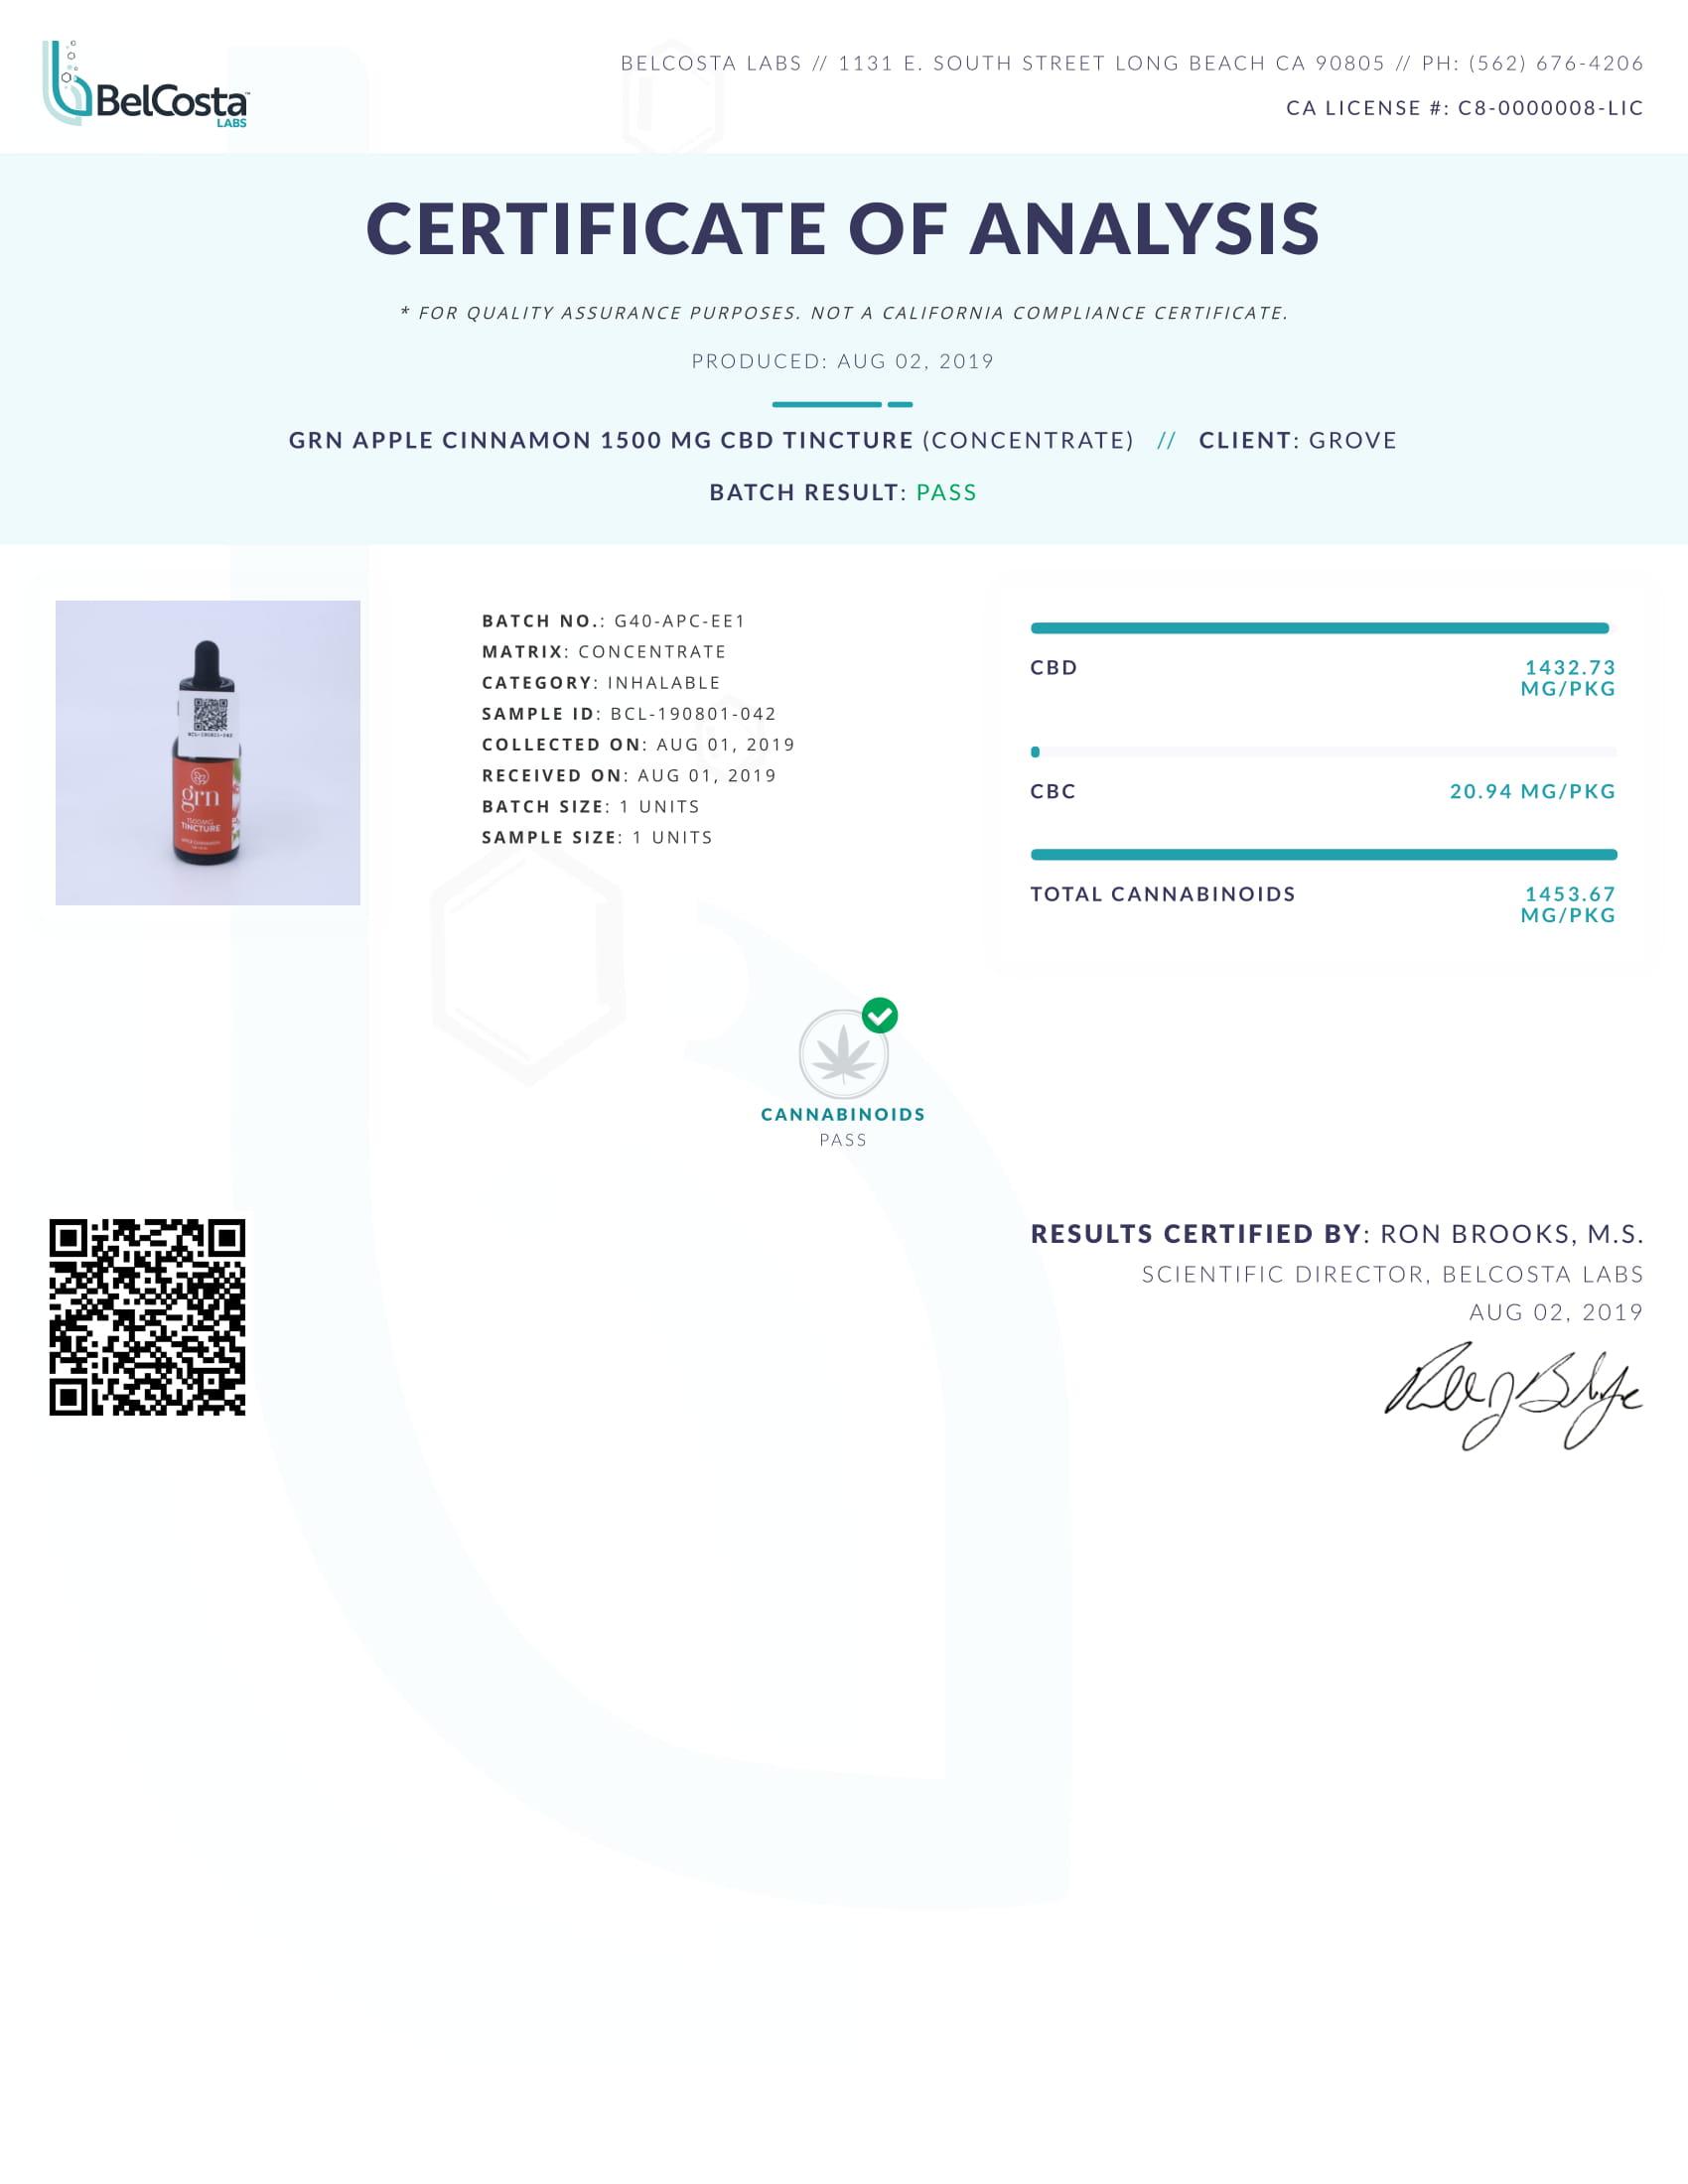 GRN CBD Oil Tincture Apple Cinnamon Lab Report Broad Spectrum 1500mg